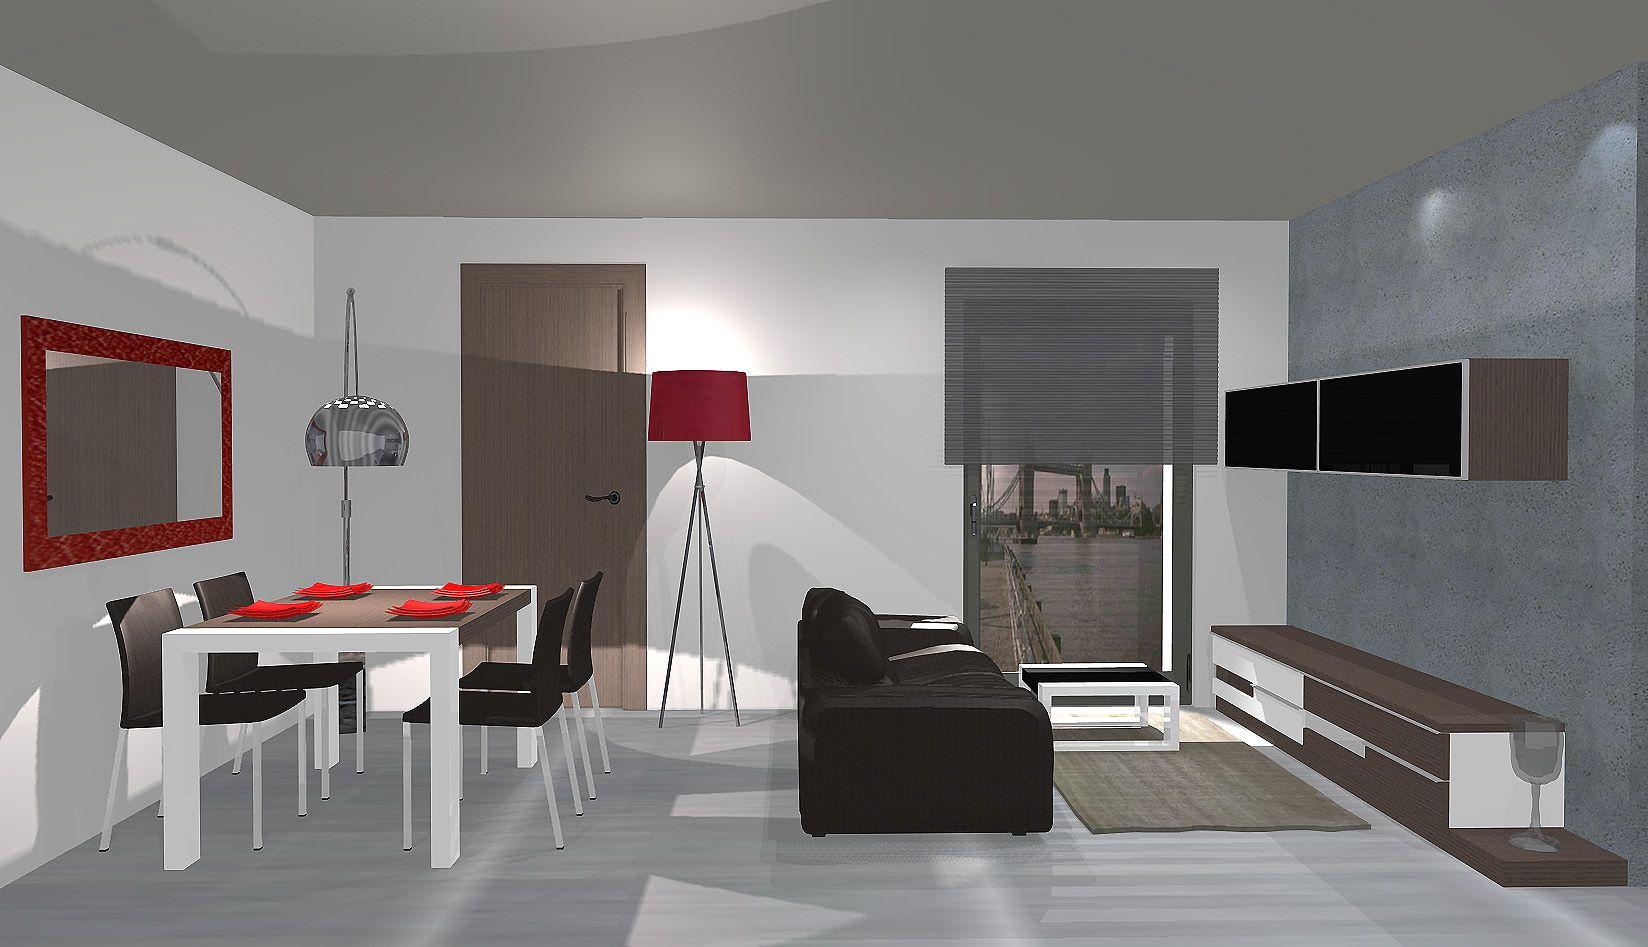 Decoracion moderno comedor sala de estar dibujos for Sala de estar dibujo